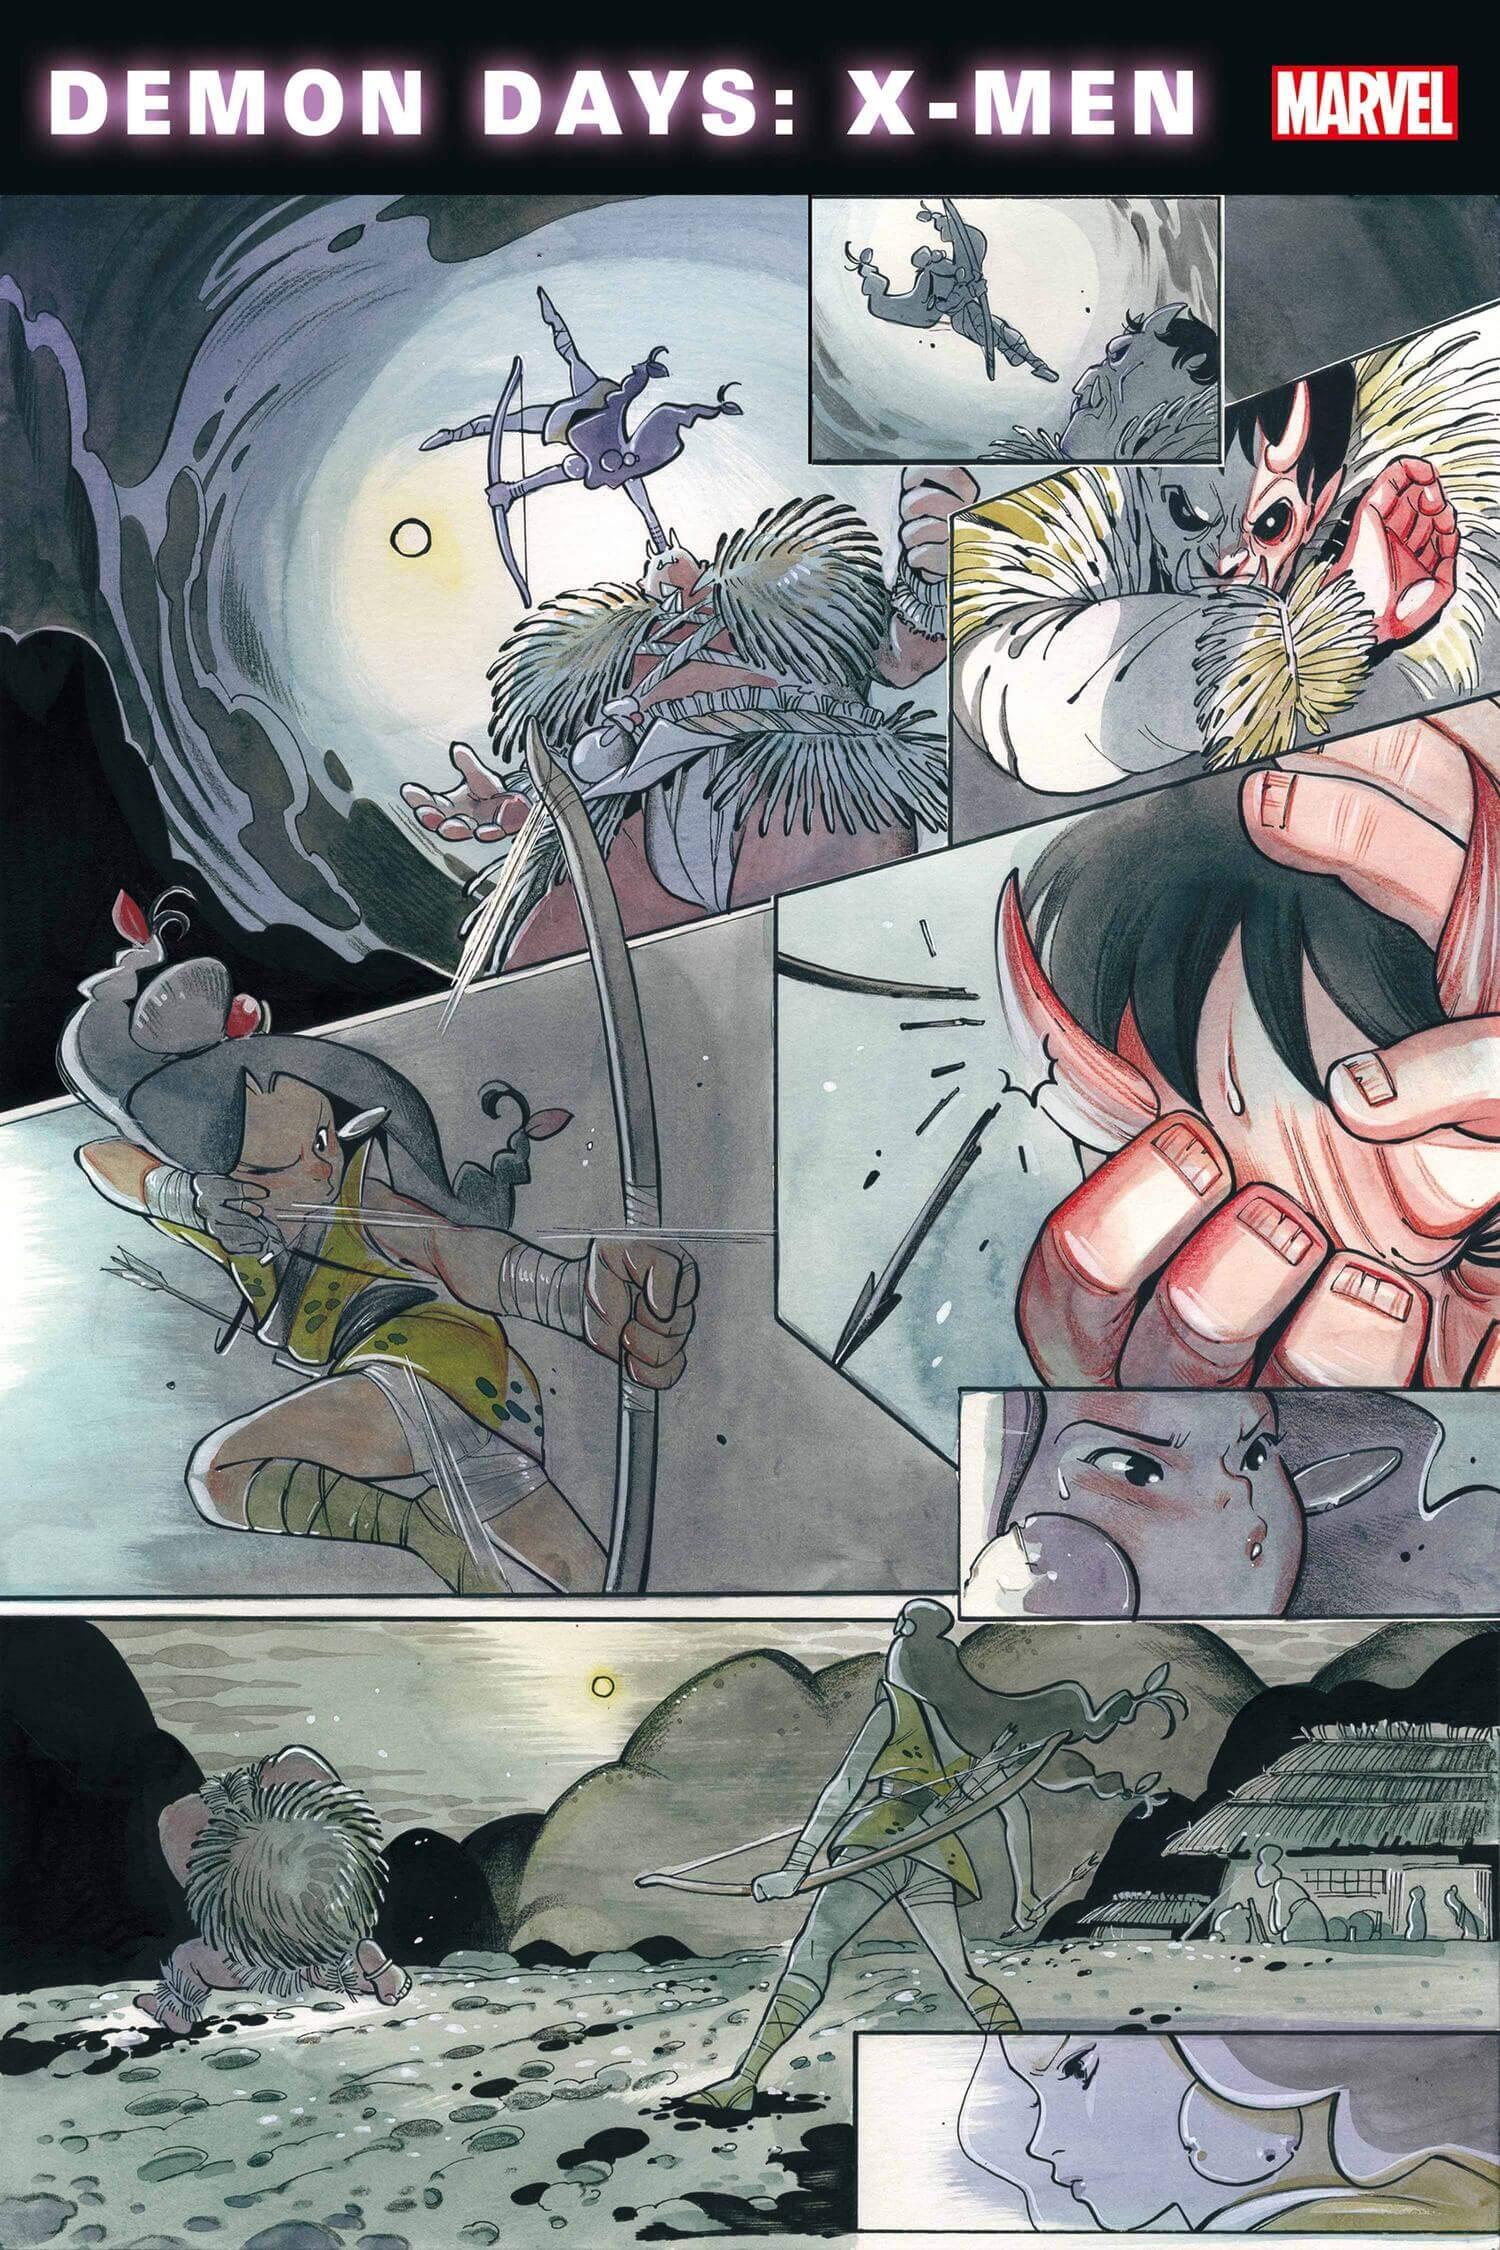 Demon Days: X-Men #1. Page 7. Zack Davisson (Translator), Ariana Maher (Letters), Peach Momoko (Writer and Artist) Marvel Comics February 24, 2021